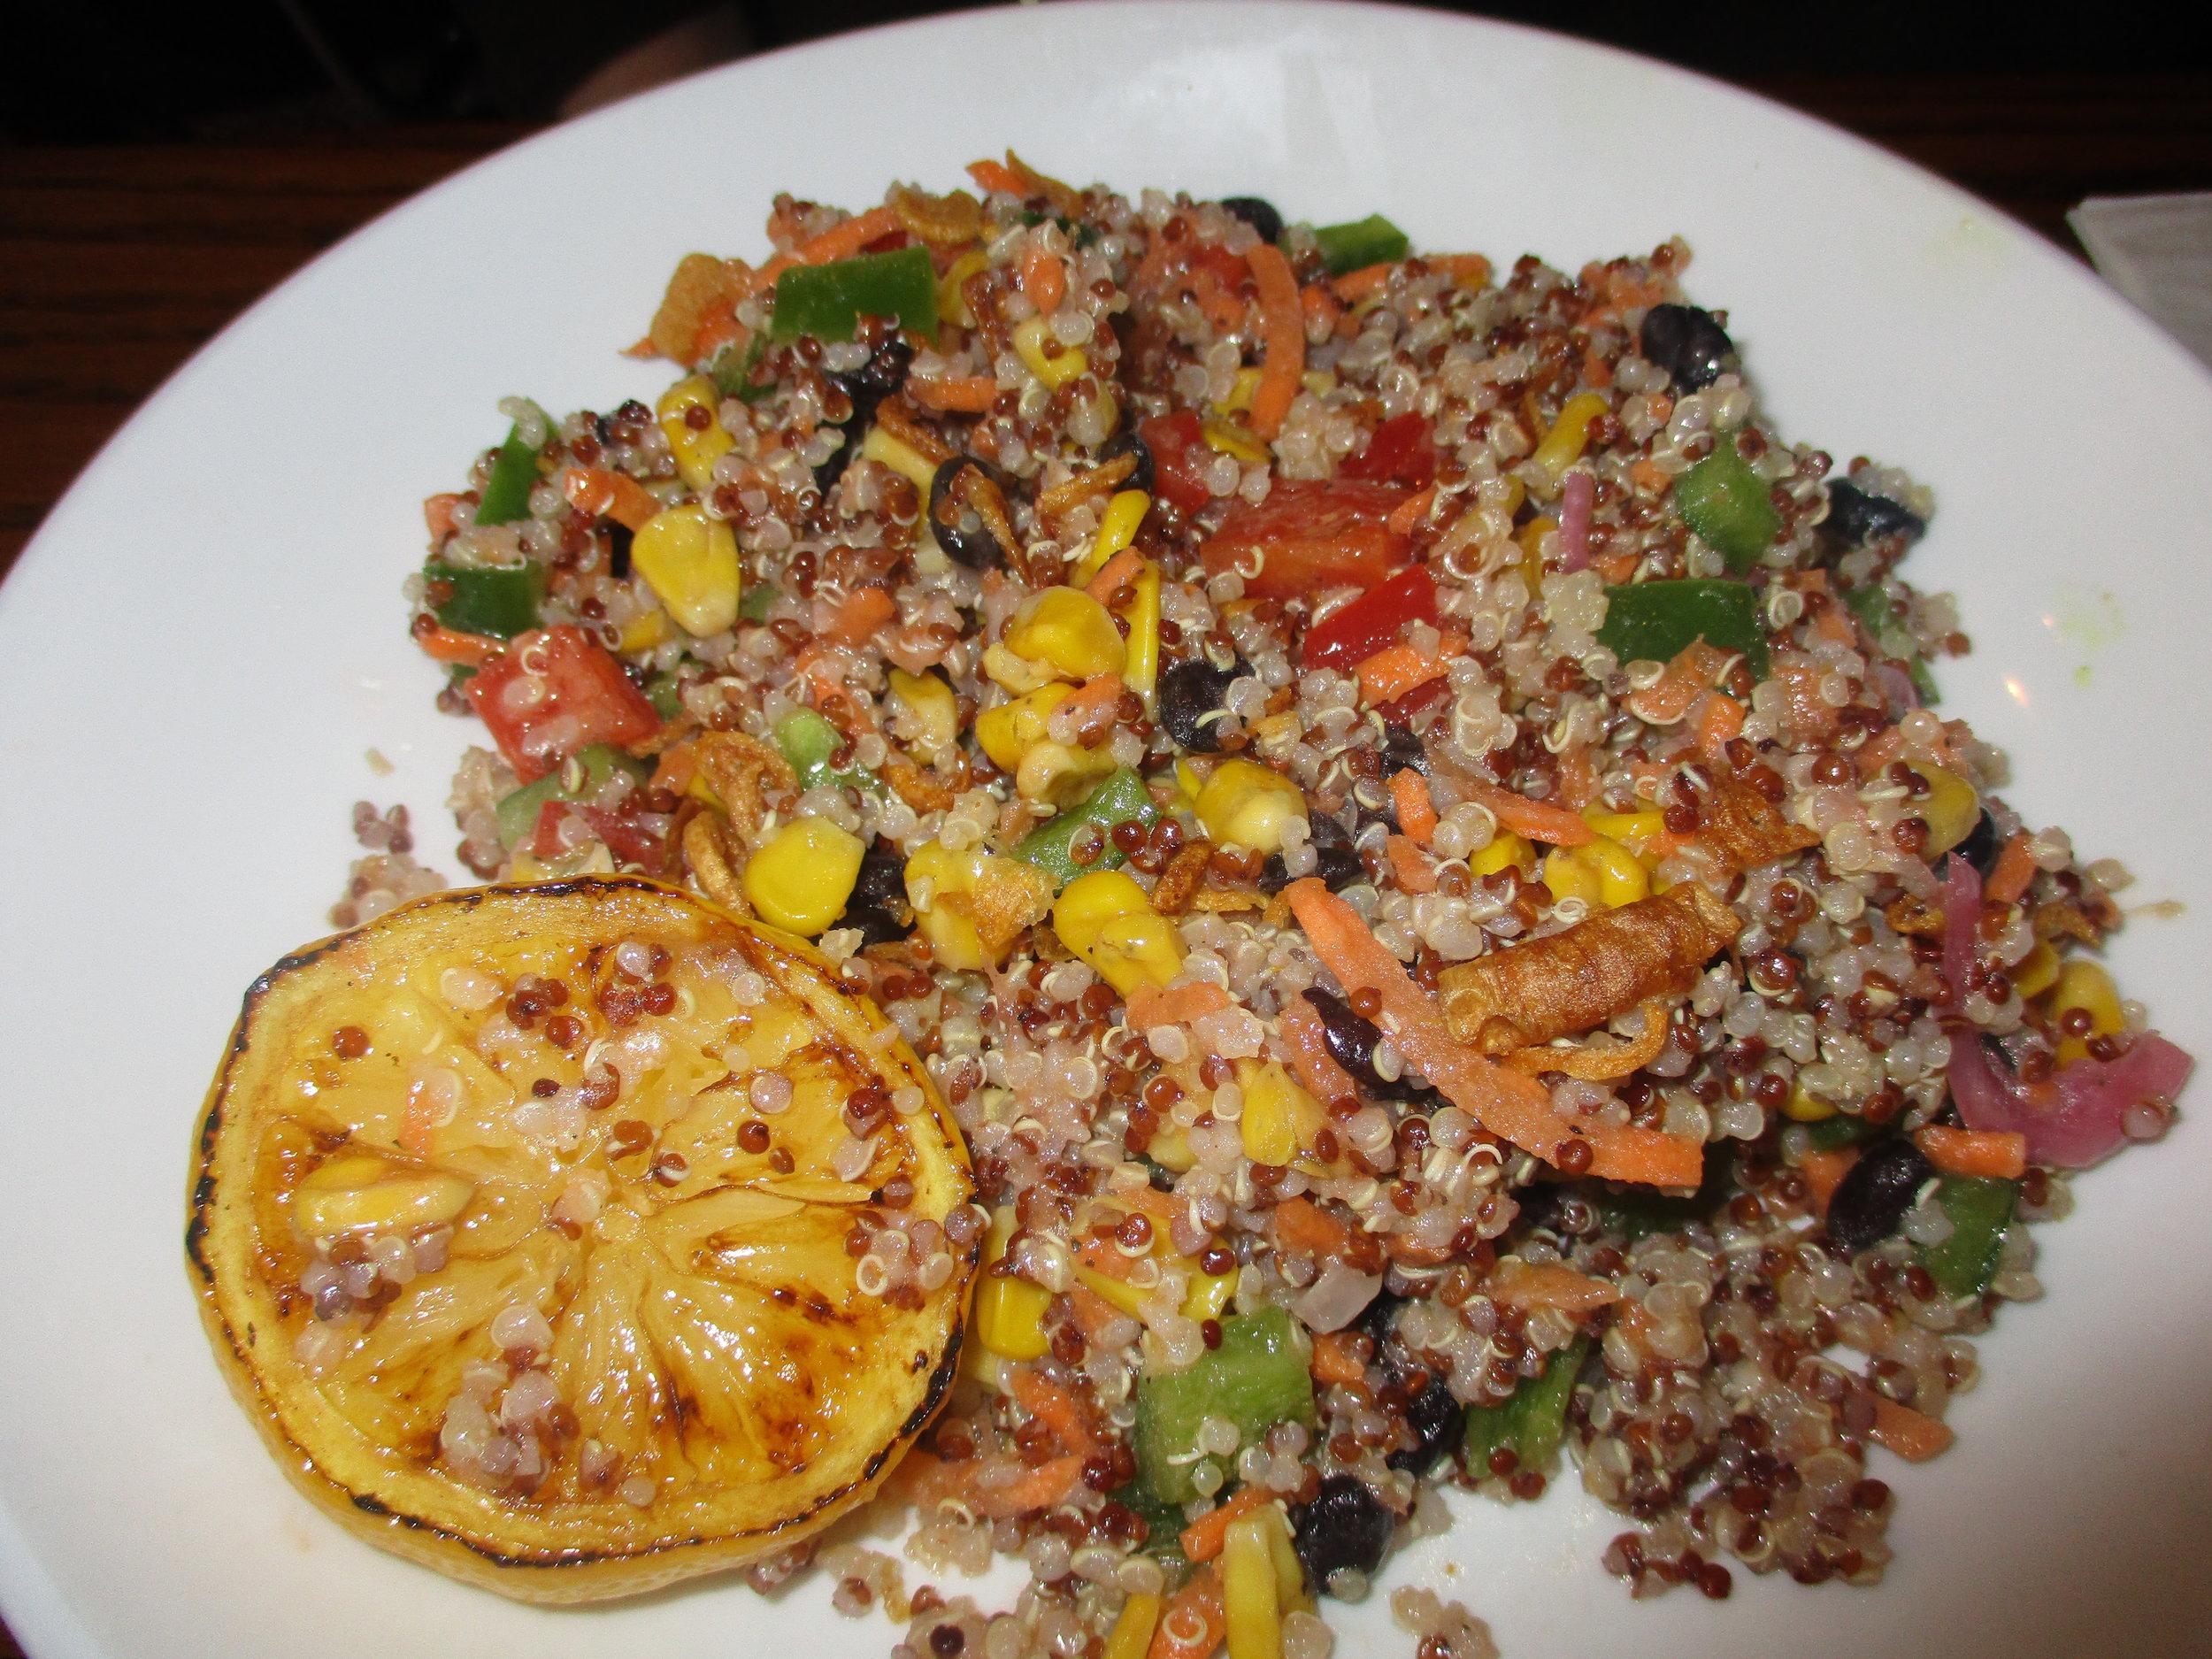 Quinoa salad at Colina Cuervo with lemon